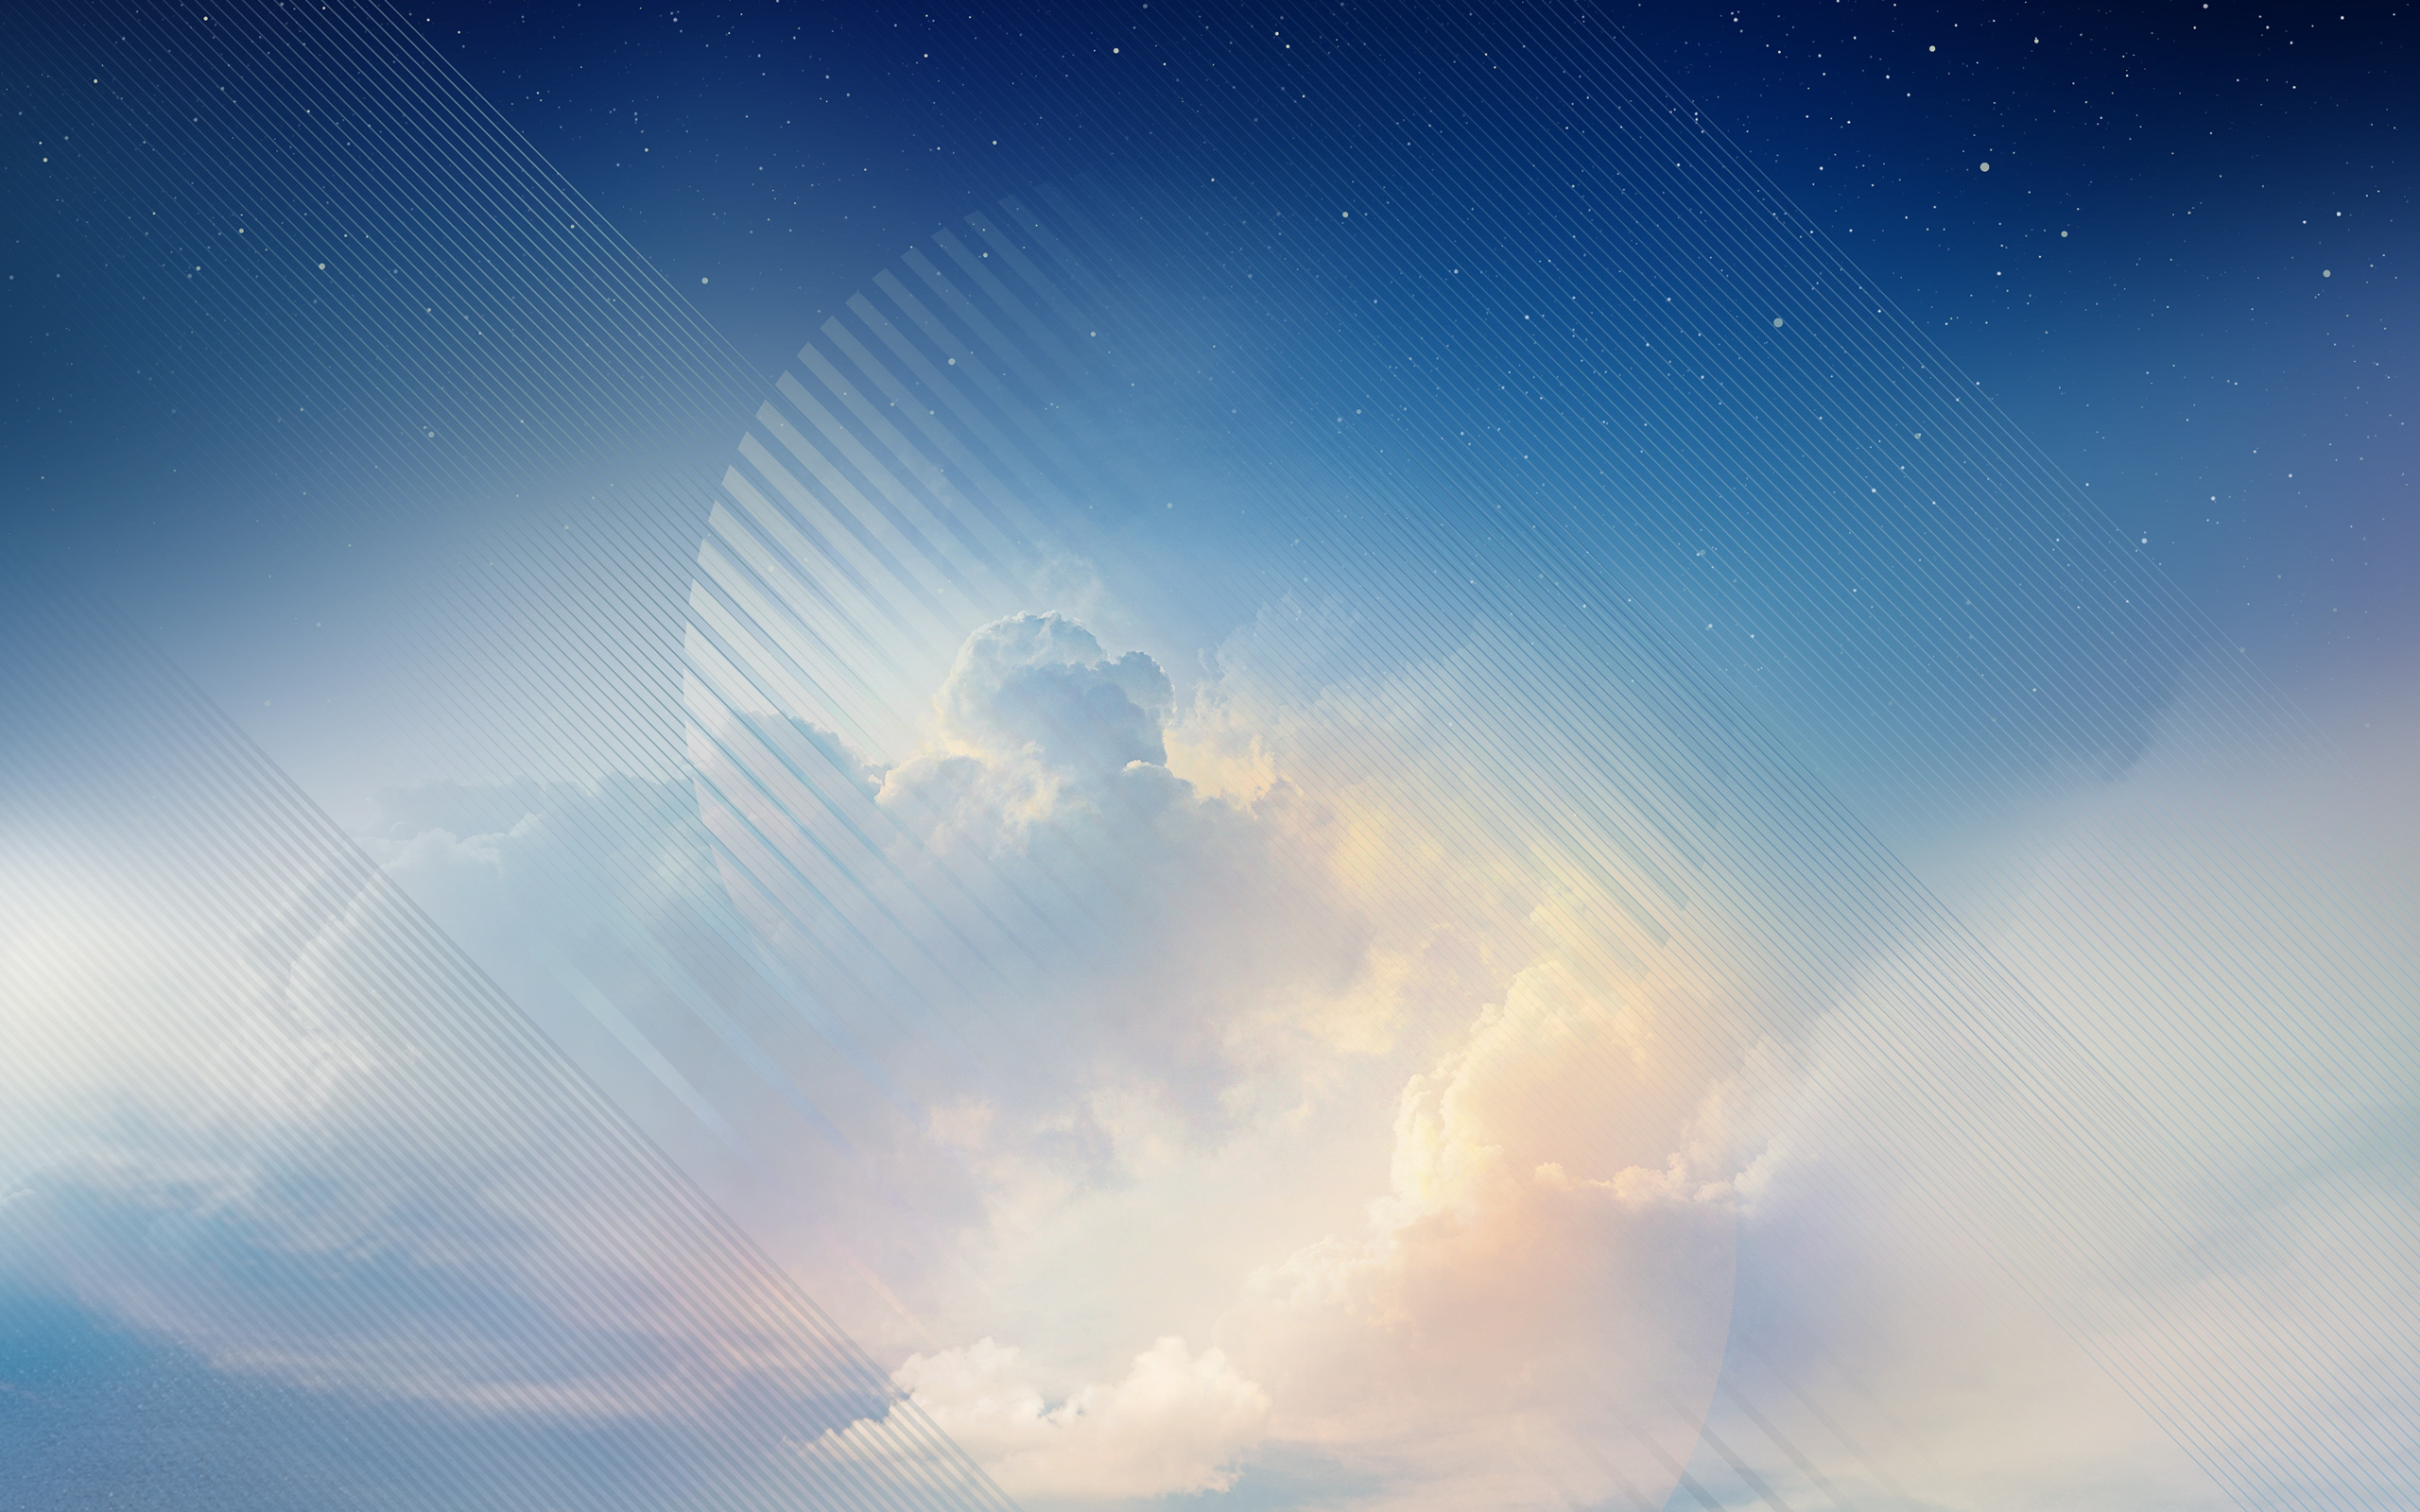 Wallpaper 4k Blue Sky Samsung Galaxy Note 8 Stock Blue Galaxy Note Samsung Sky Stock V20